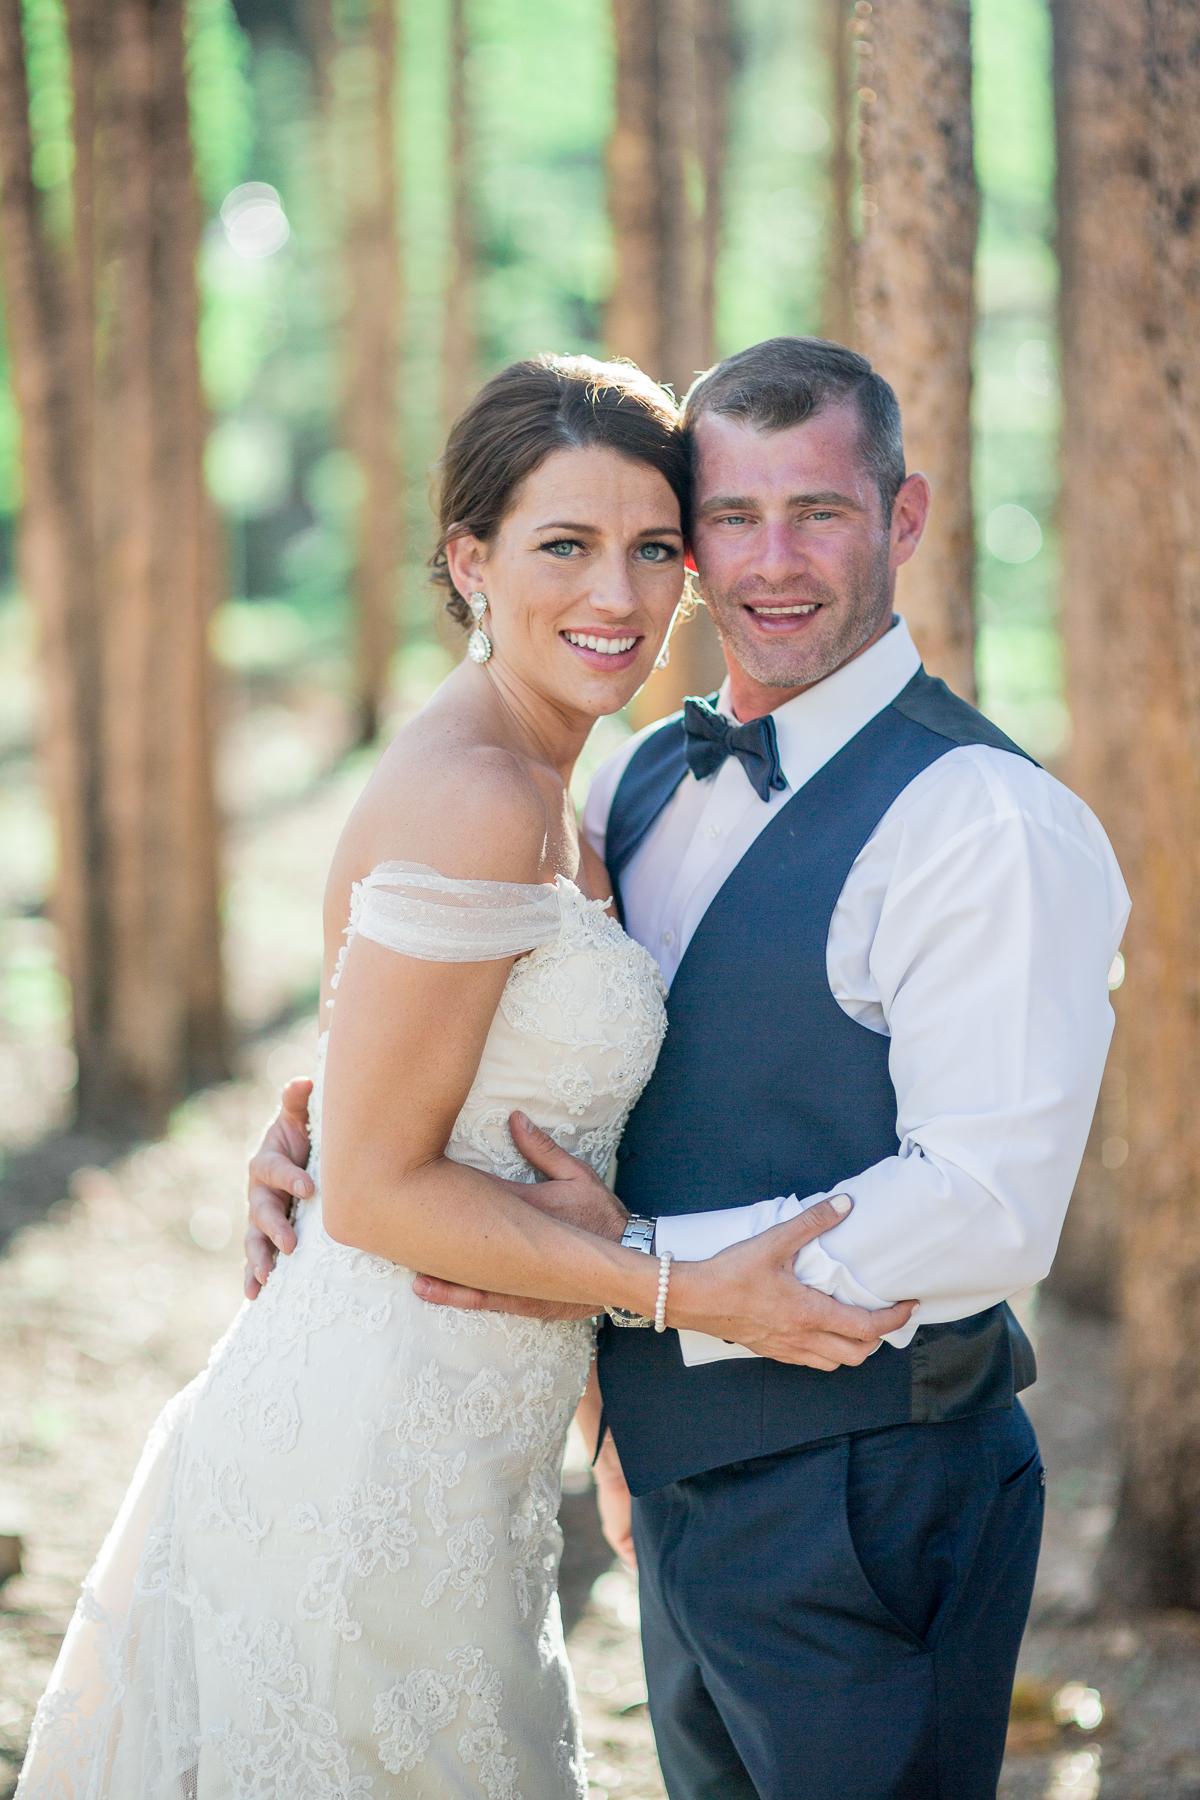 StaciDesign-Colorado-Wedding-5466.jpg